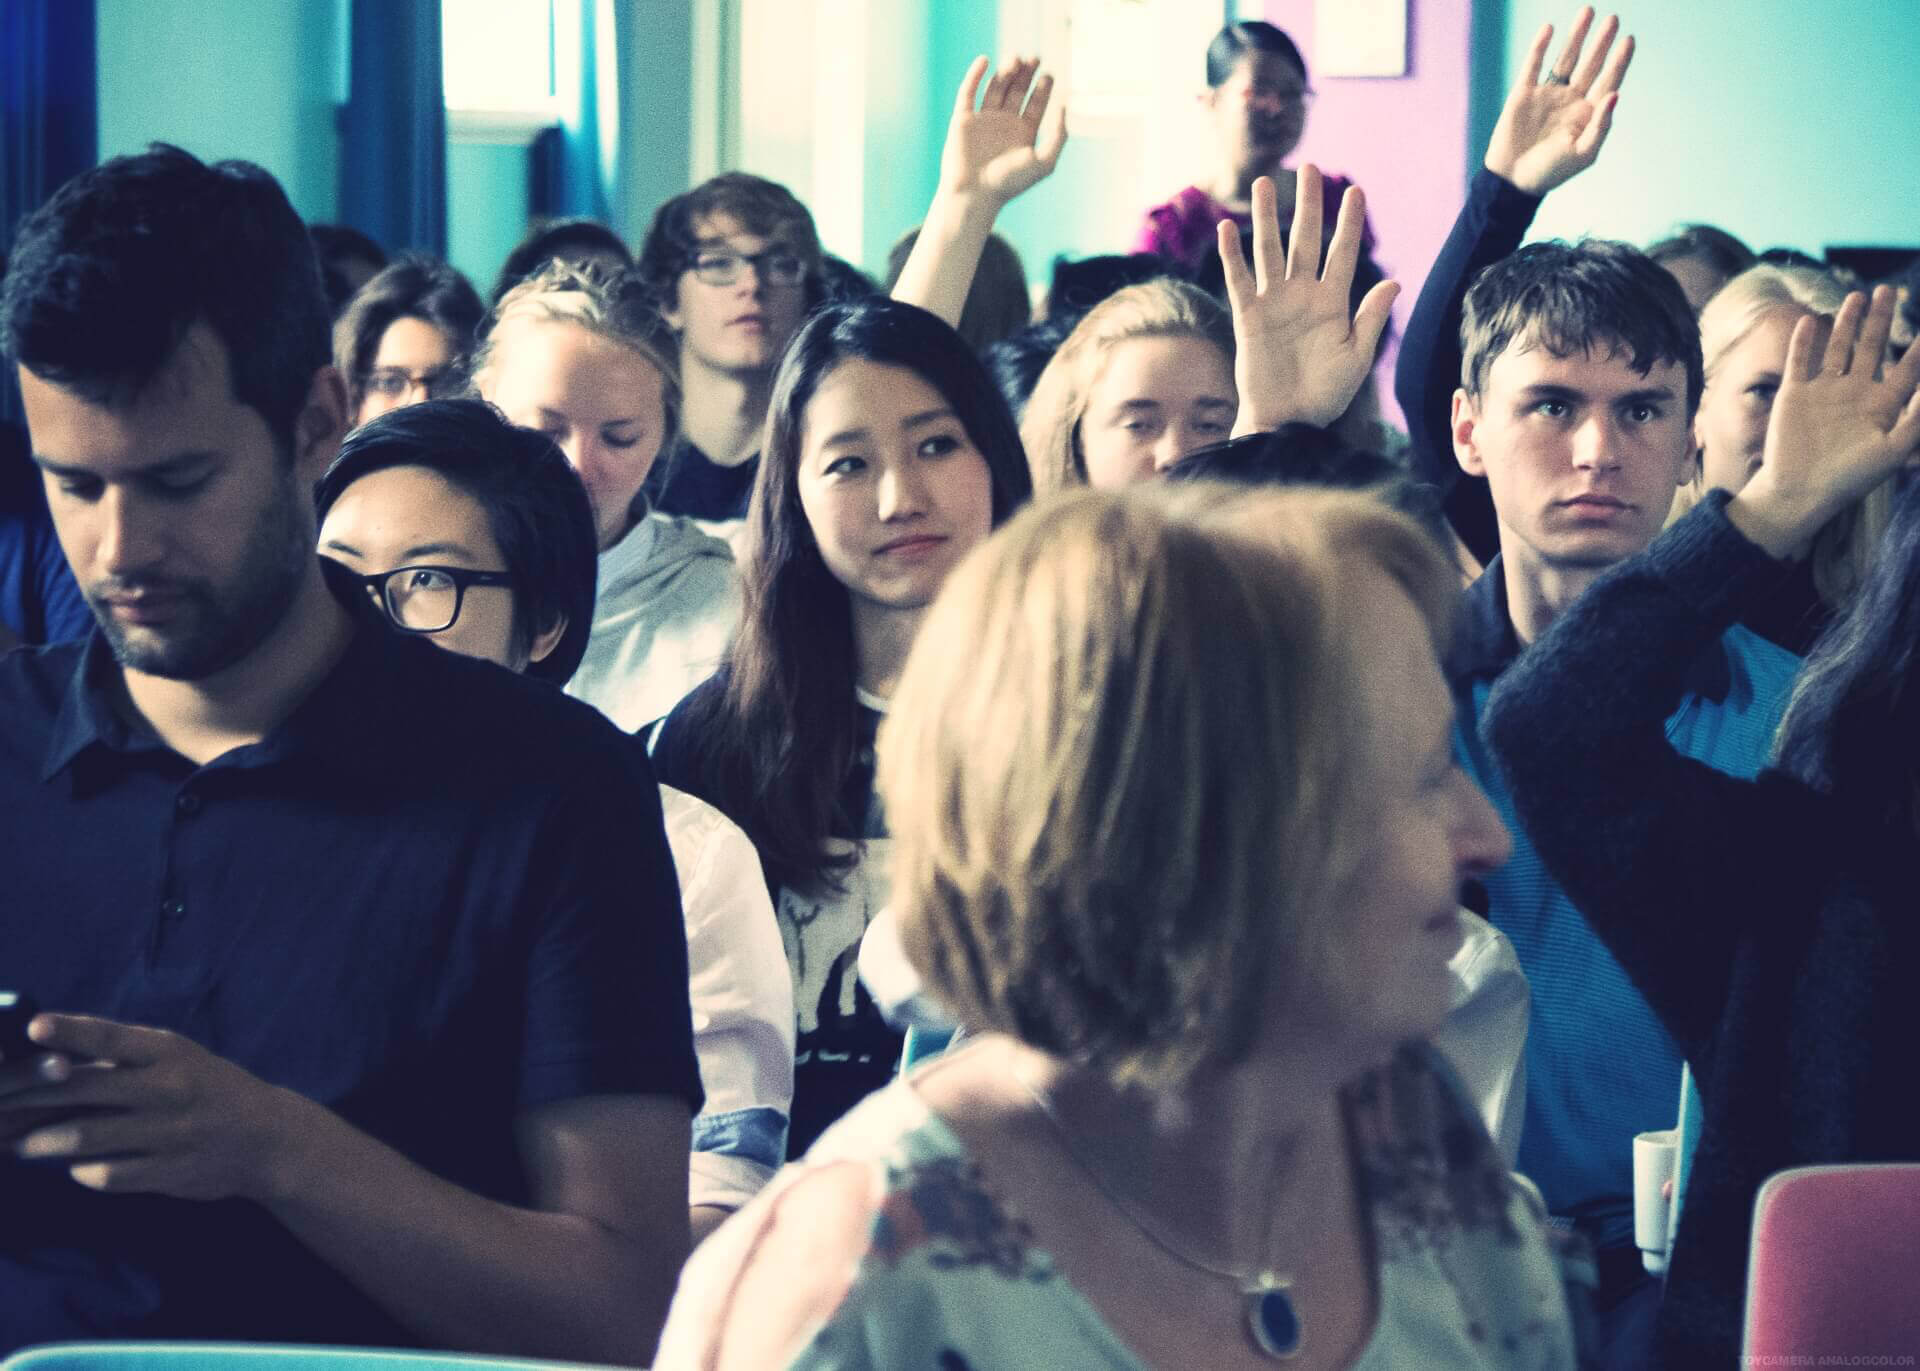 Morning Fellowship at International People's College - An International Folk High School in Denmark